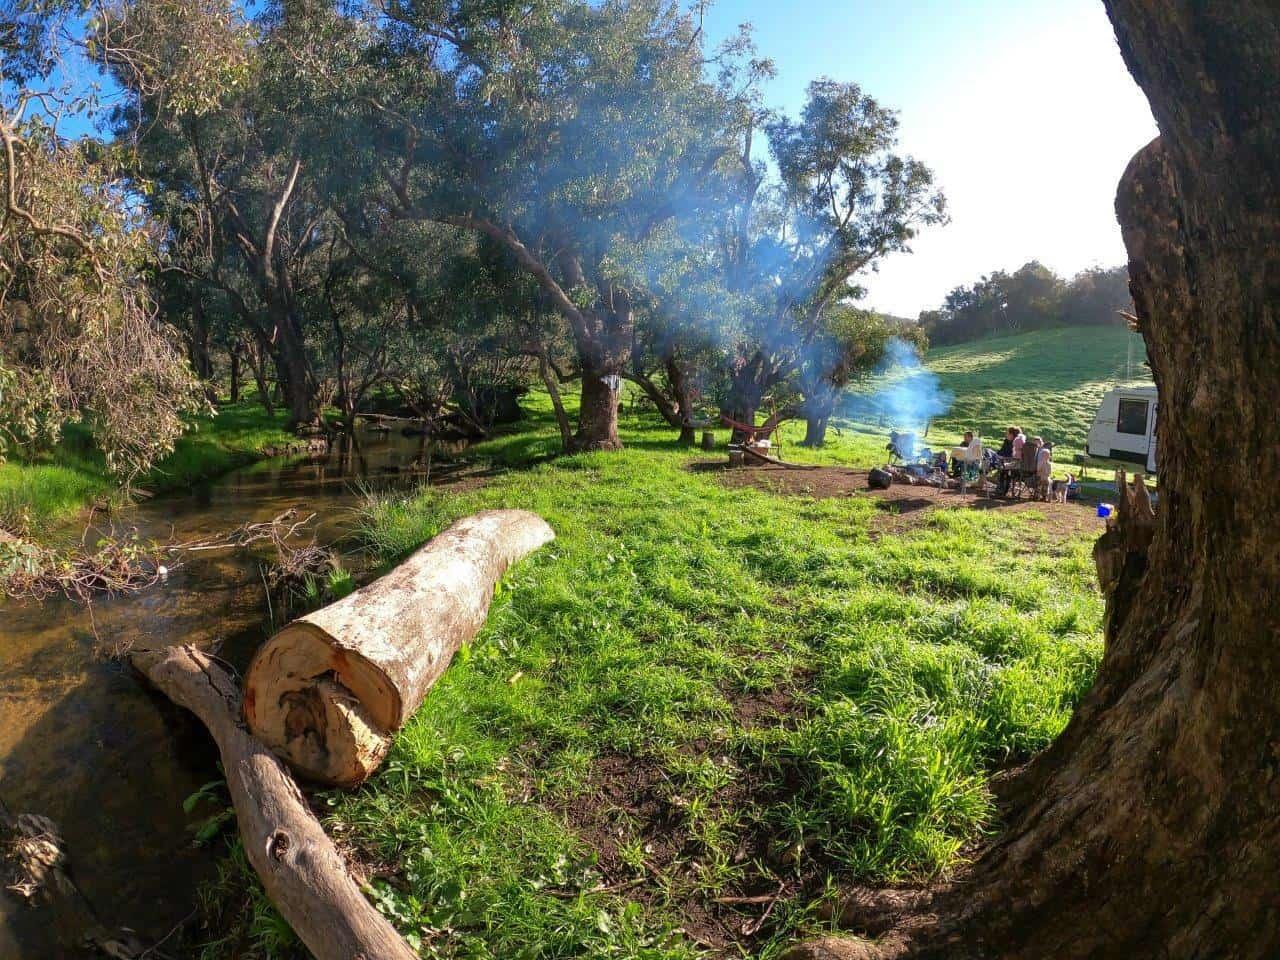 Camping at Bolinda Vale Grazing